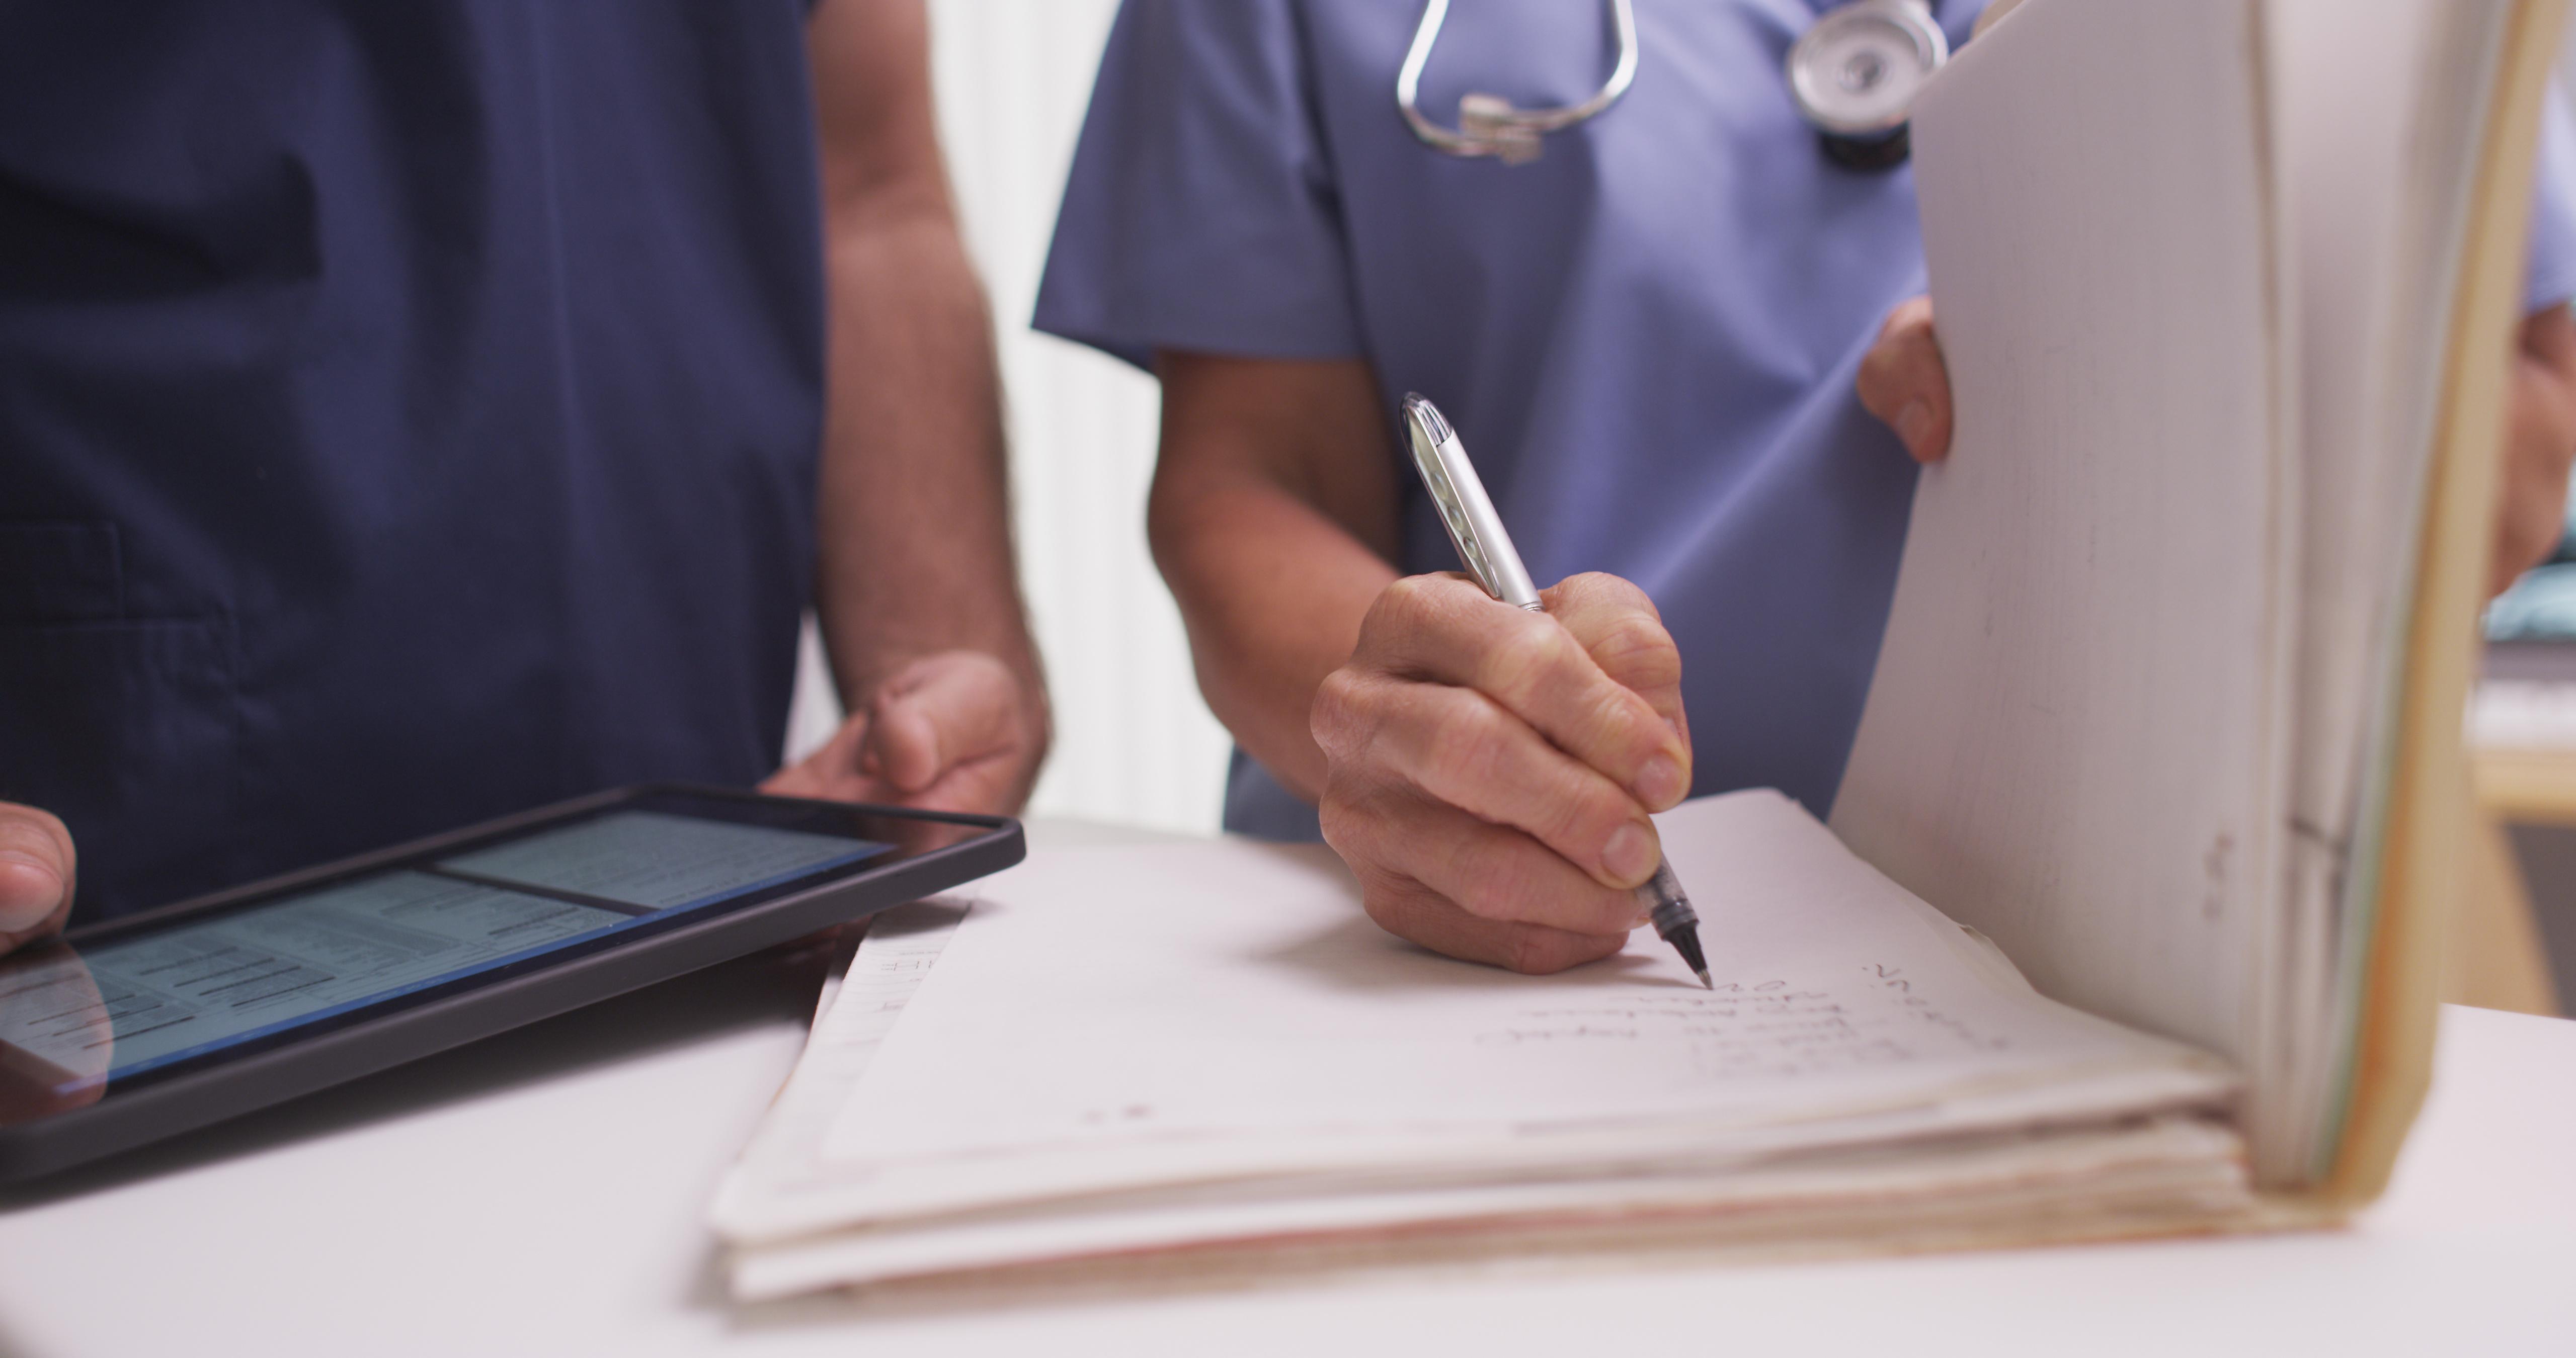 Florida House passes nurse practitioner legislation, but will Senate leadership get in the way?